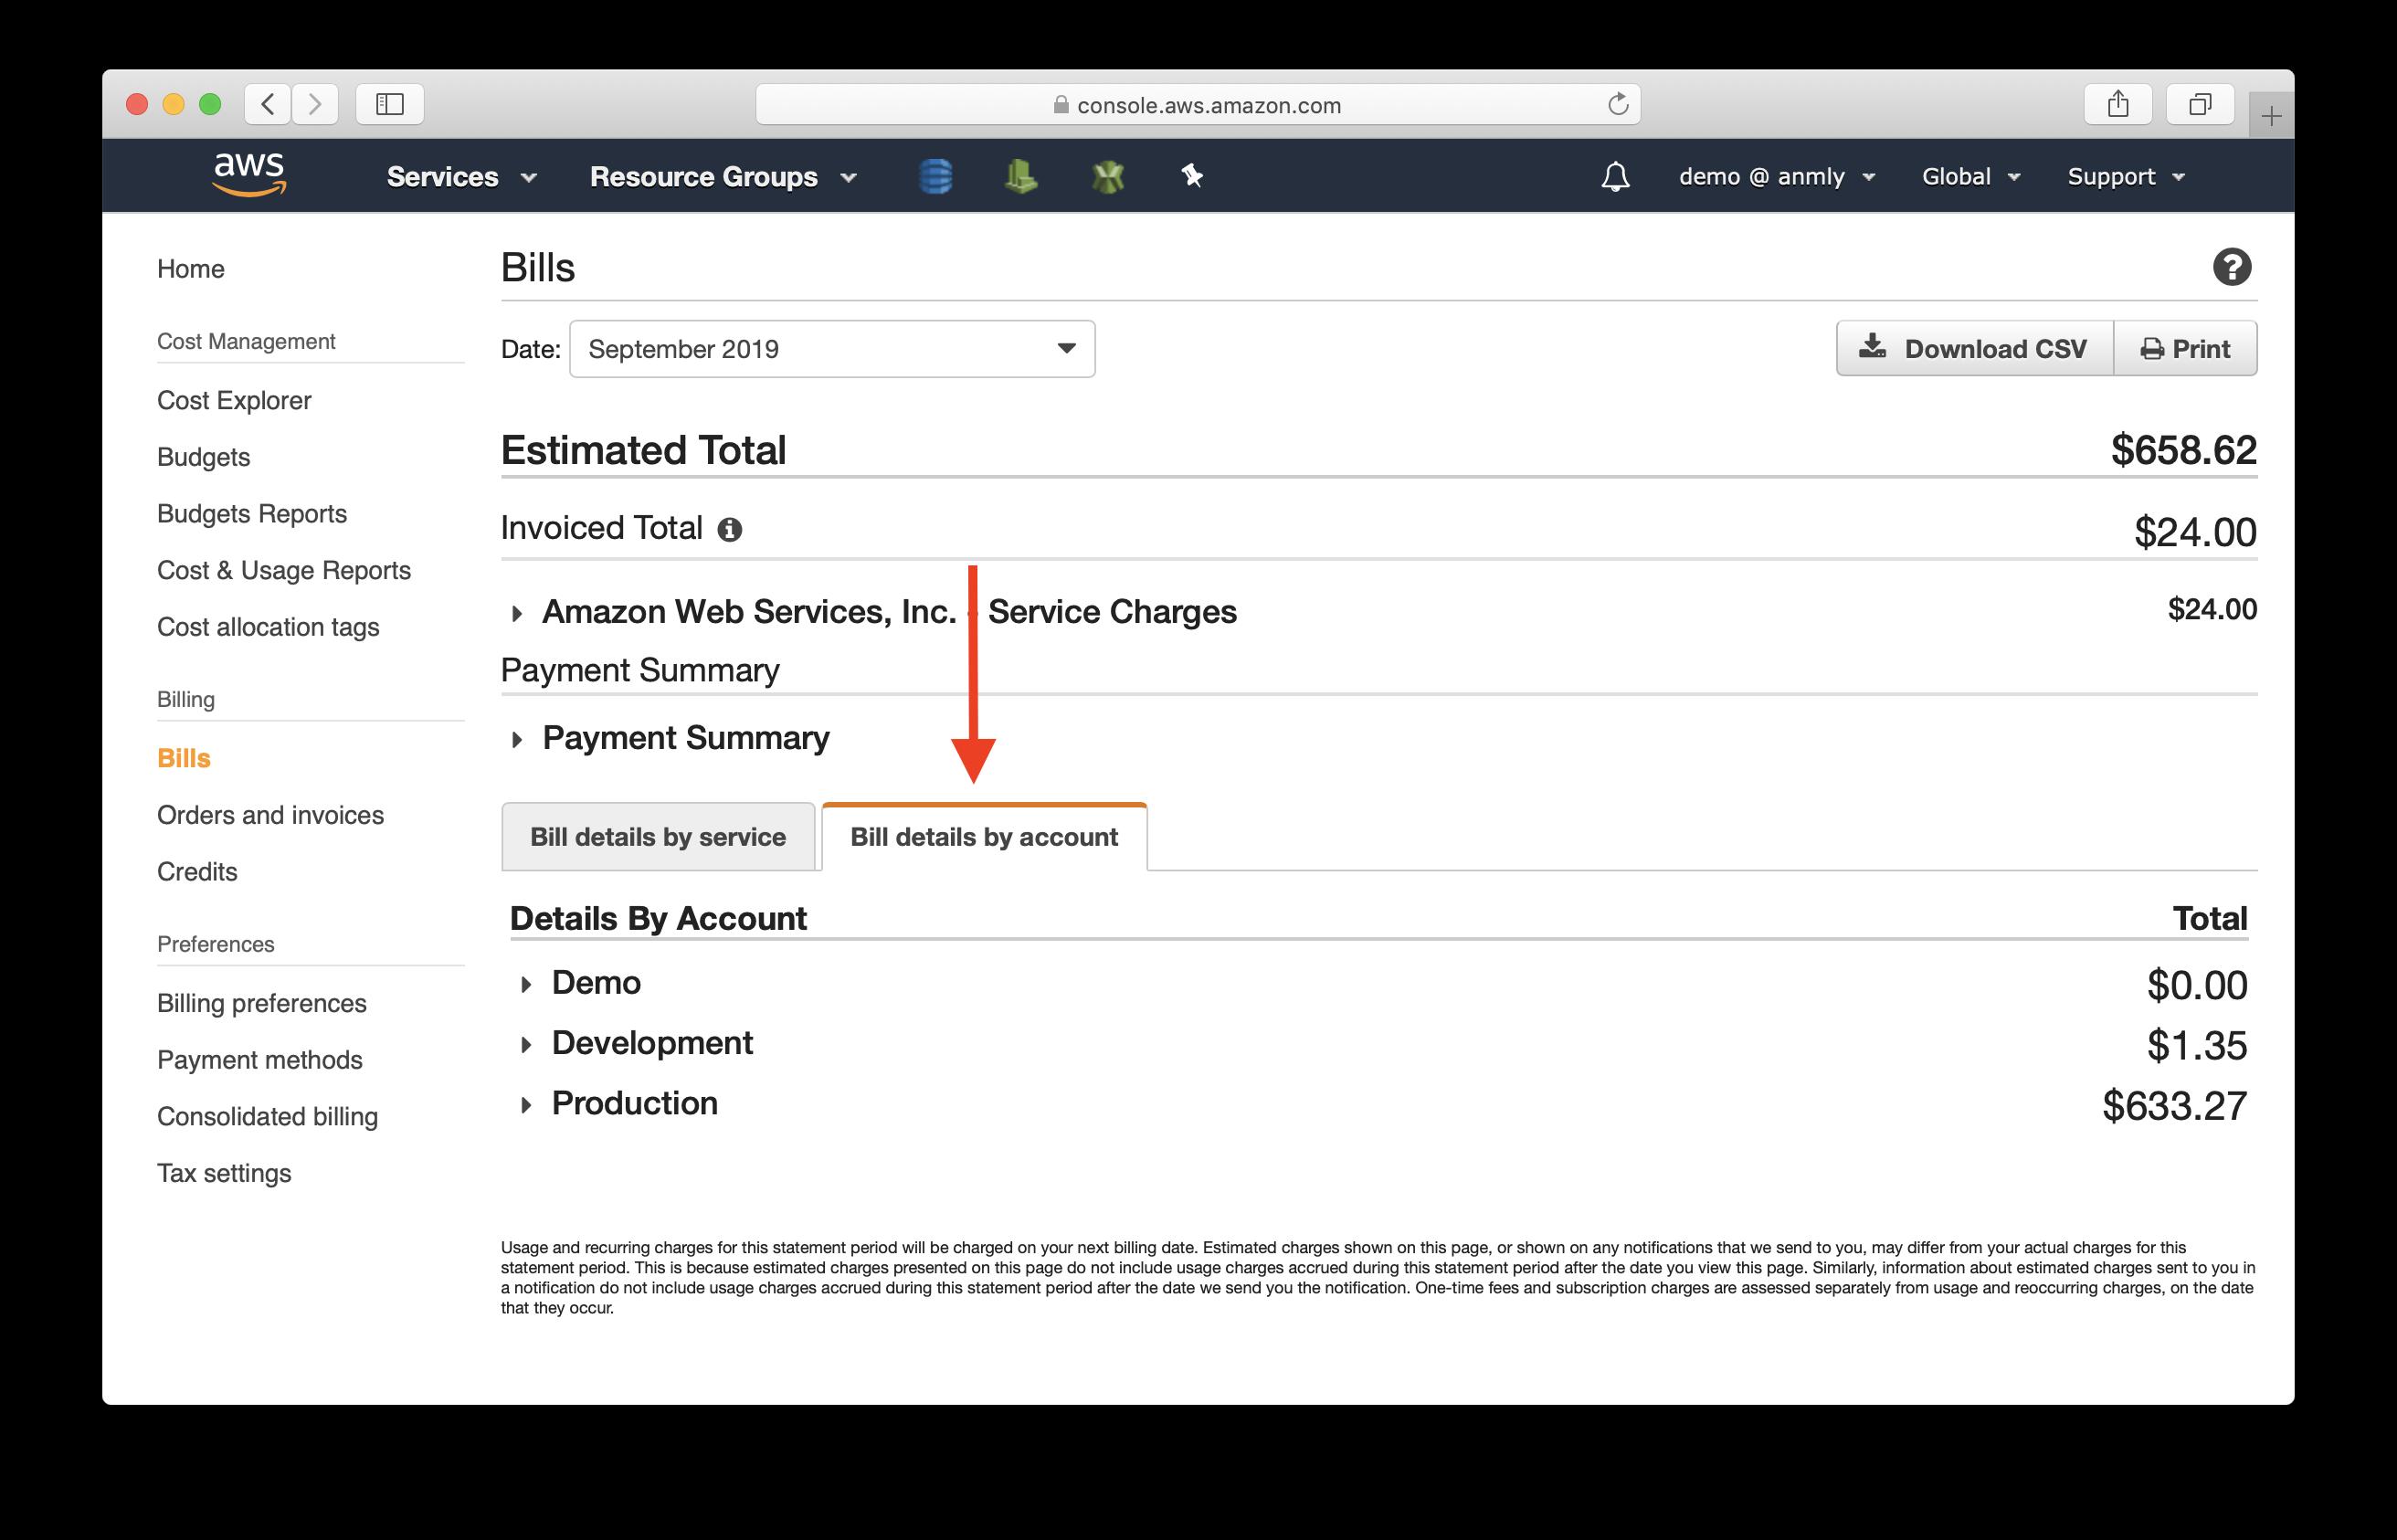 Select Bill details by account screenshot